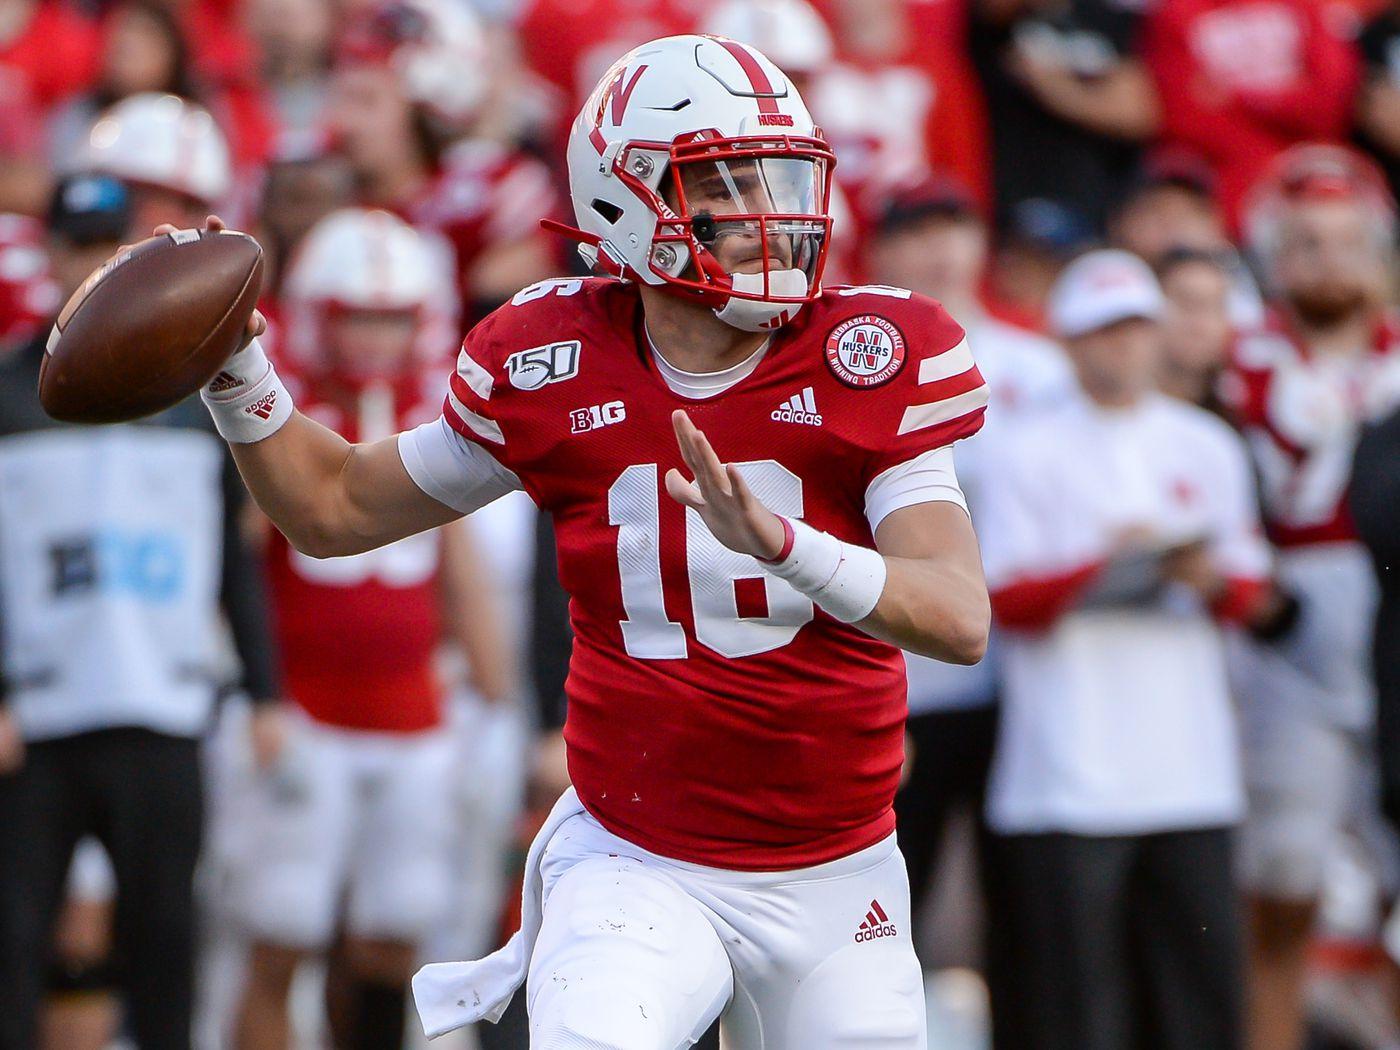 Nebraska Qb Noah Vedral Transfers To Rutgers On The Banks